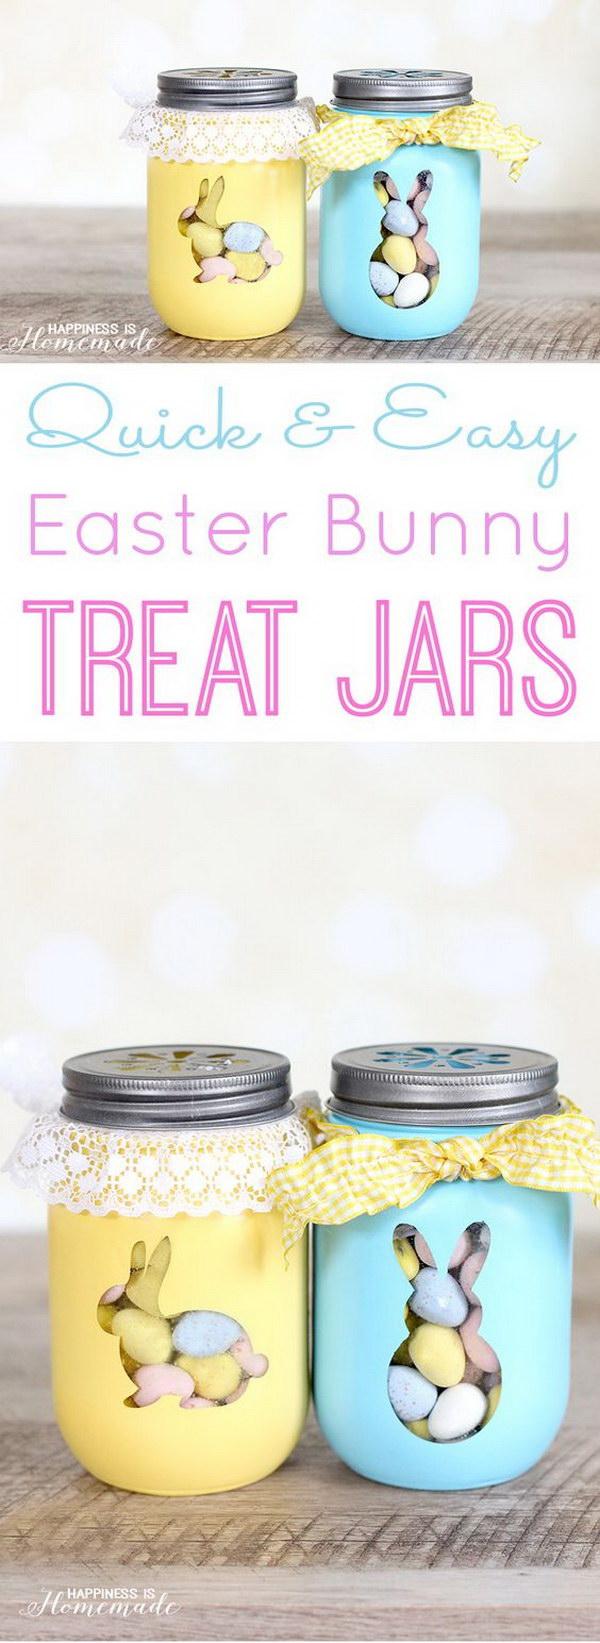 18 Easter Bunny Treat Jars